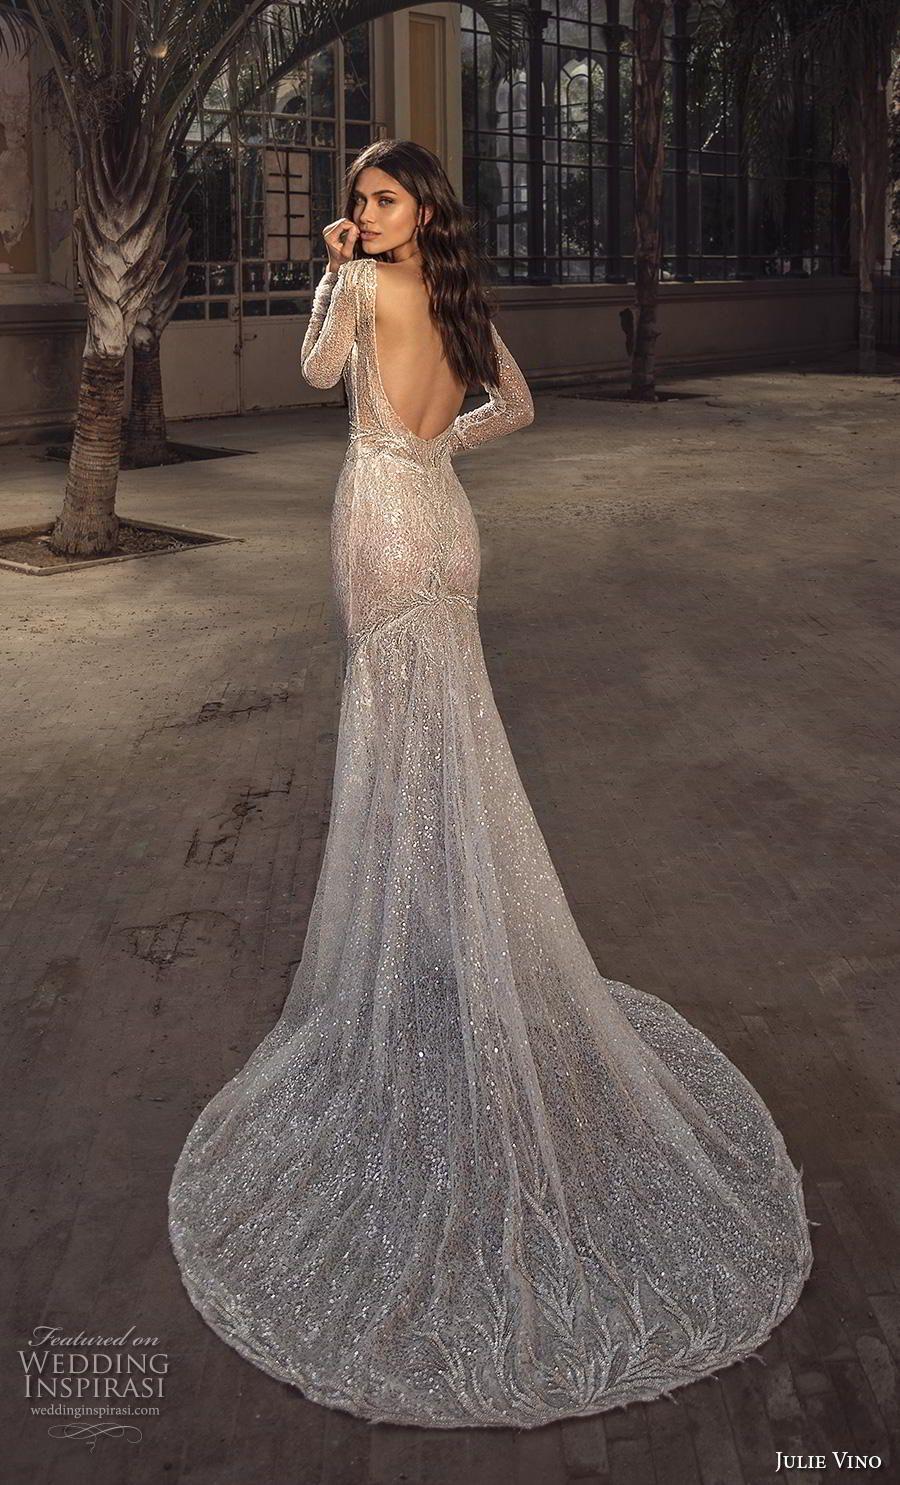 Julie Vino Spring 2020 Wedding Dresses Barcelona Bridal Collection Wedding Inspirasi Glitter Wedding Dress Julie Vino Wedding Dress Wedding Dresses [ 1485 x 900 Pixel ]